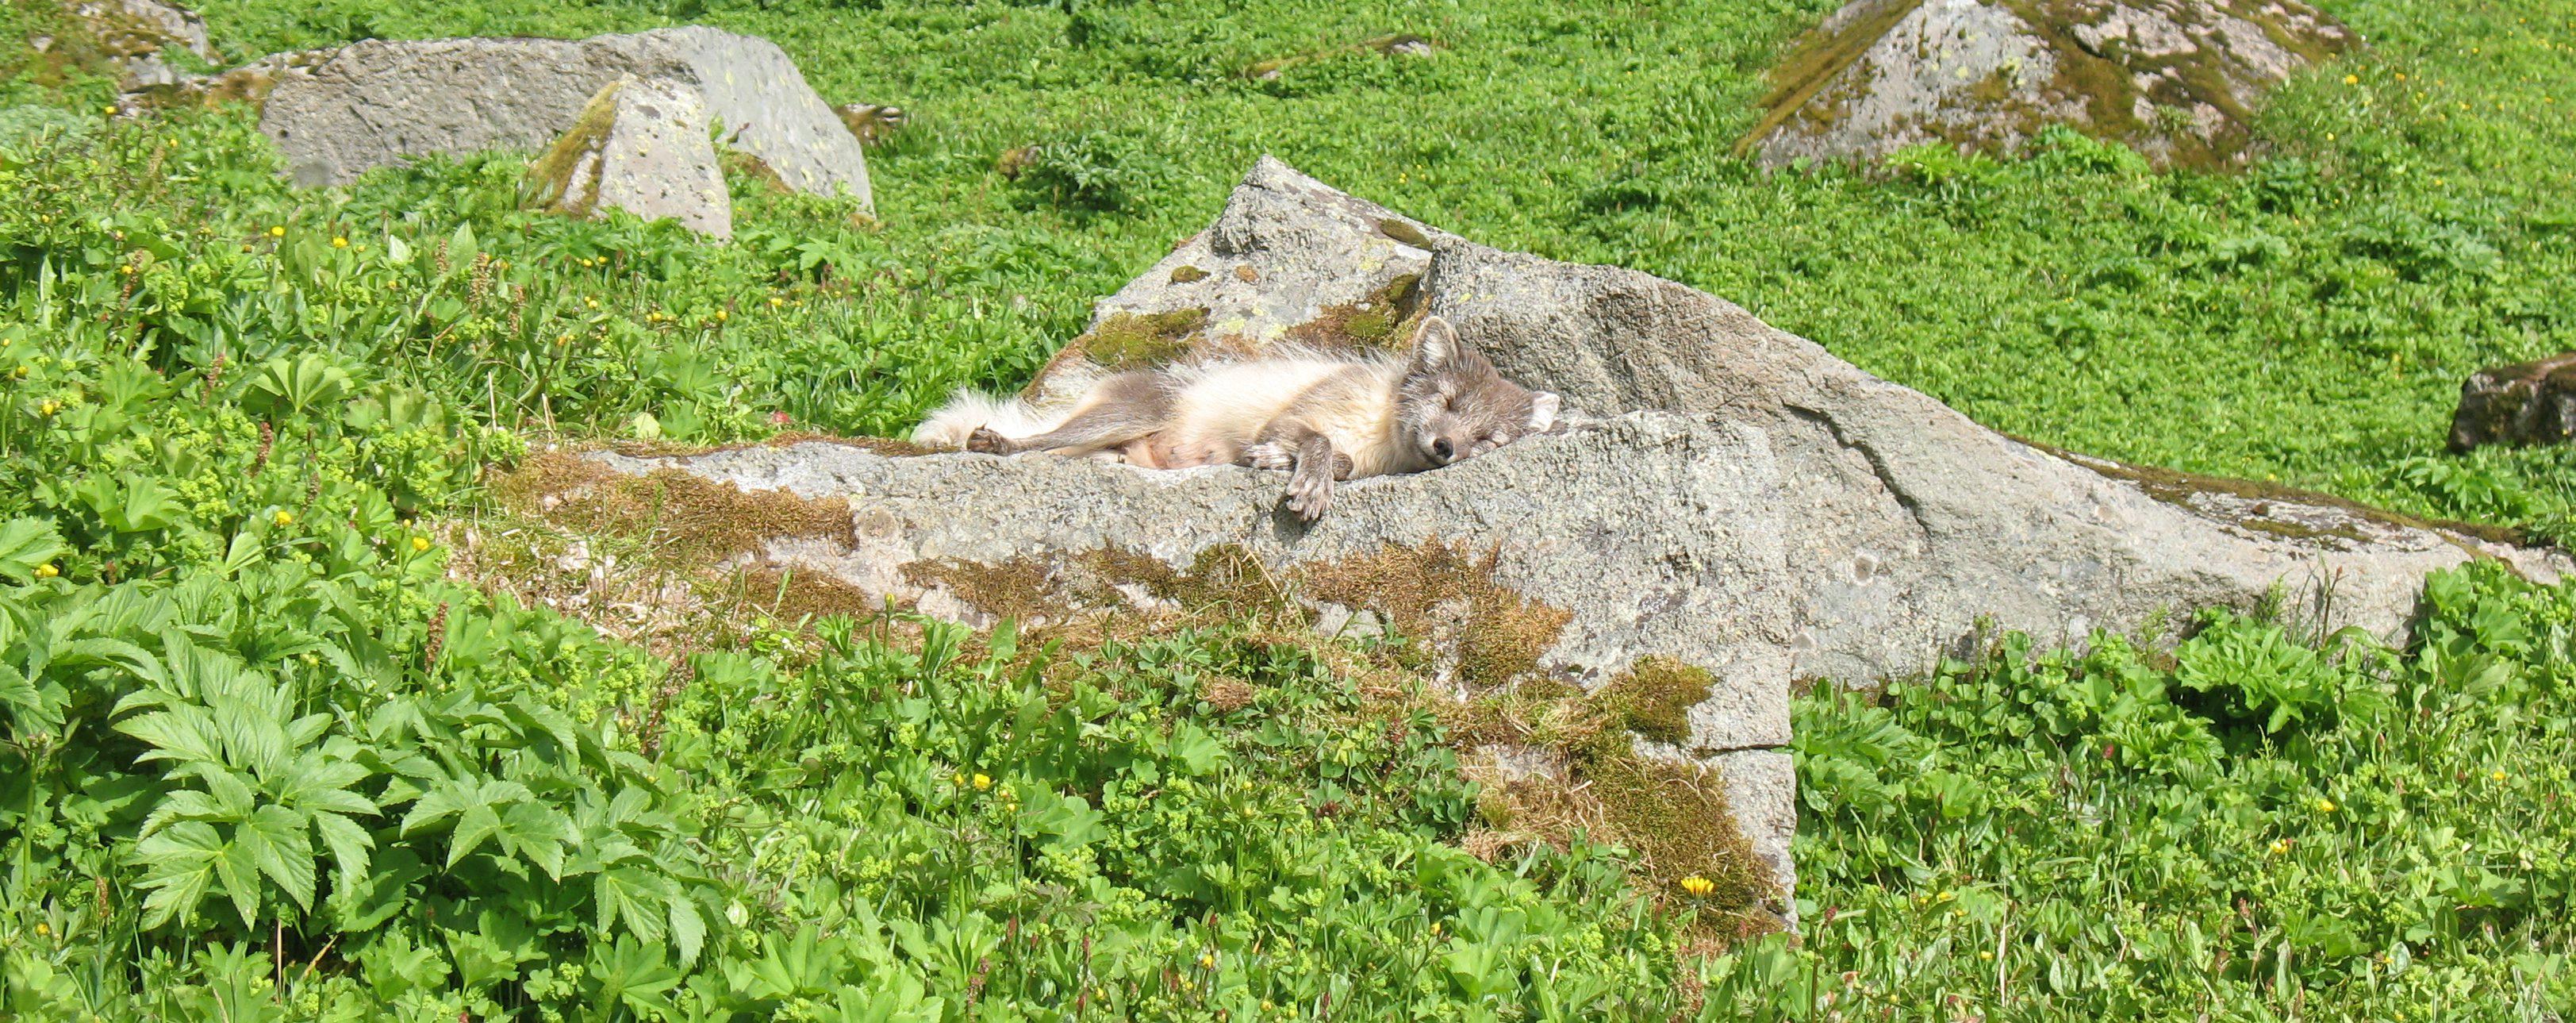 polarfuchs-hornstrandir-island-panorama-aldis